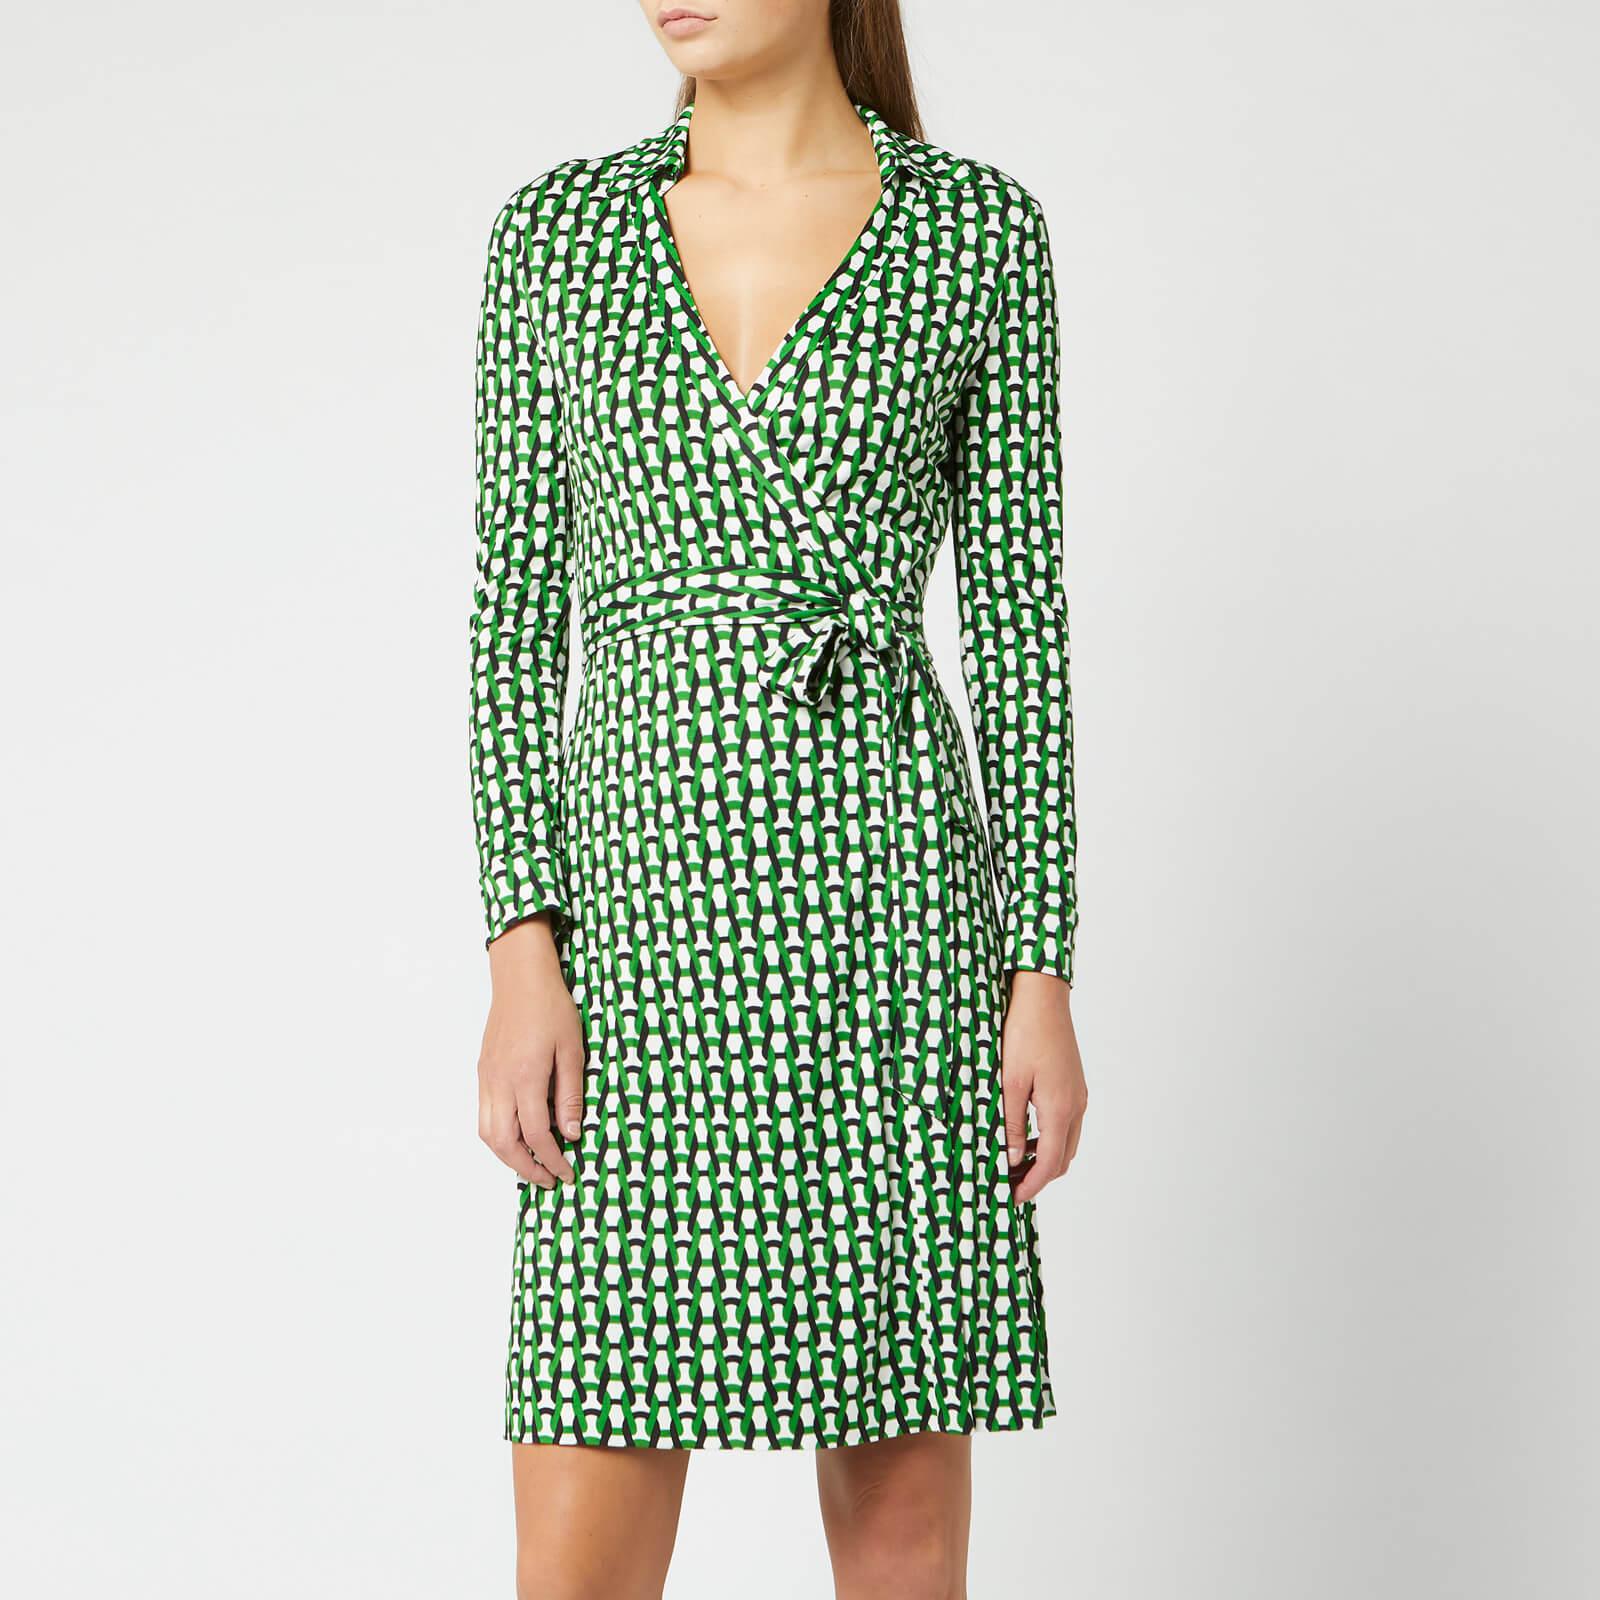 dac145066a6a9 Diane von Furstenberg Women's New Jeanne Two Dress - Vintage Trellis Lawn -  Free UK Delivery over £50